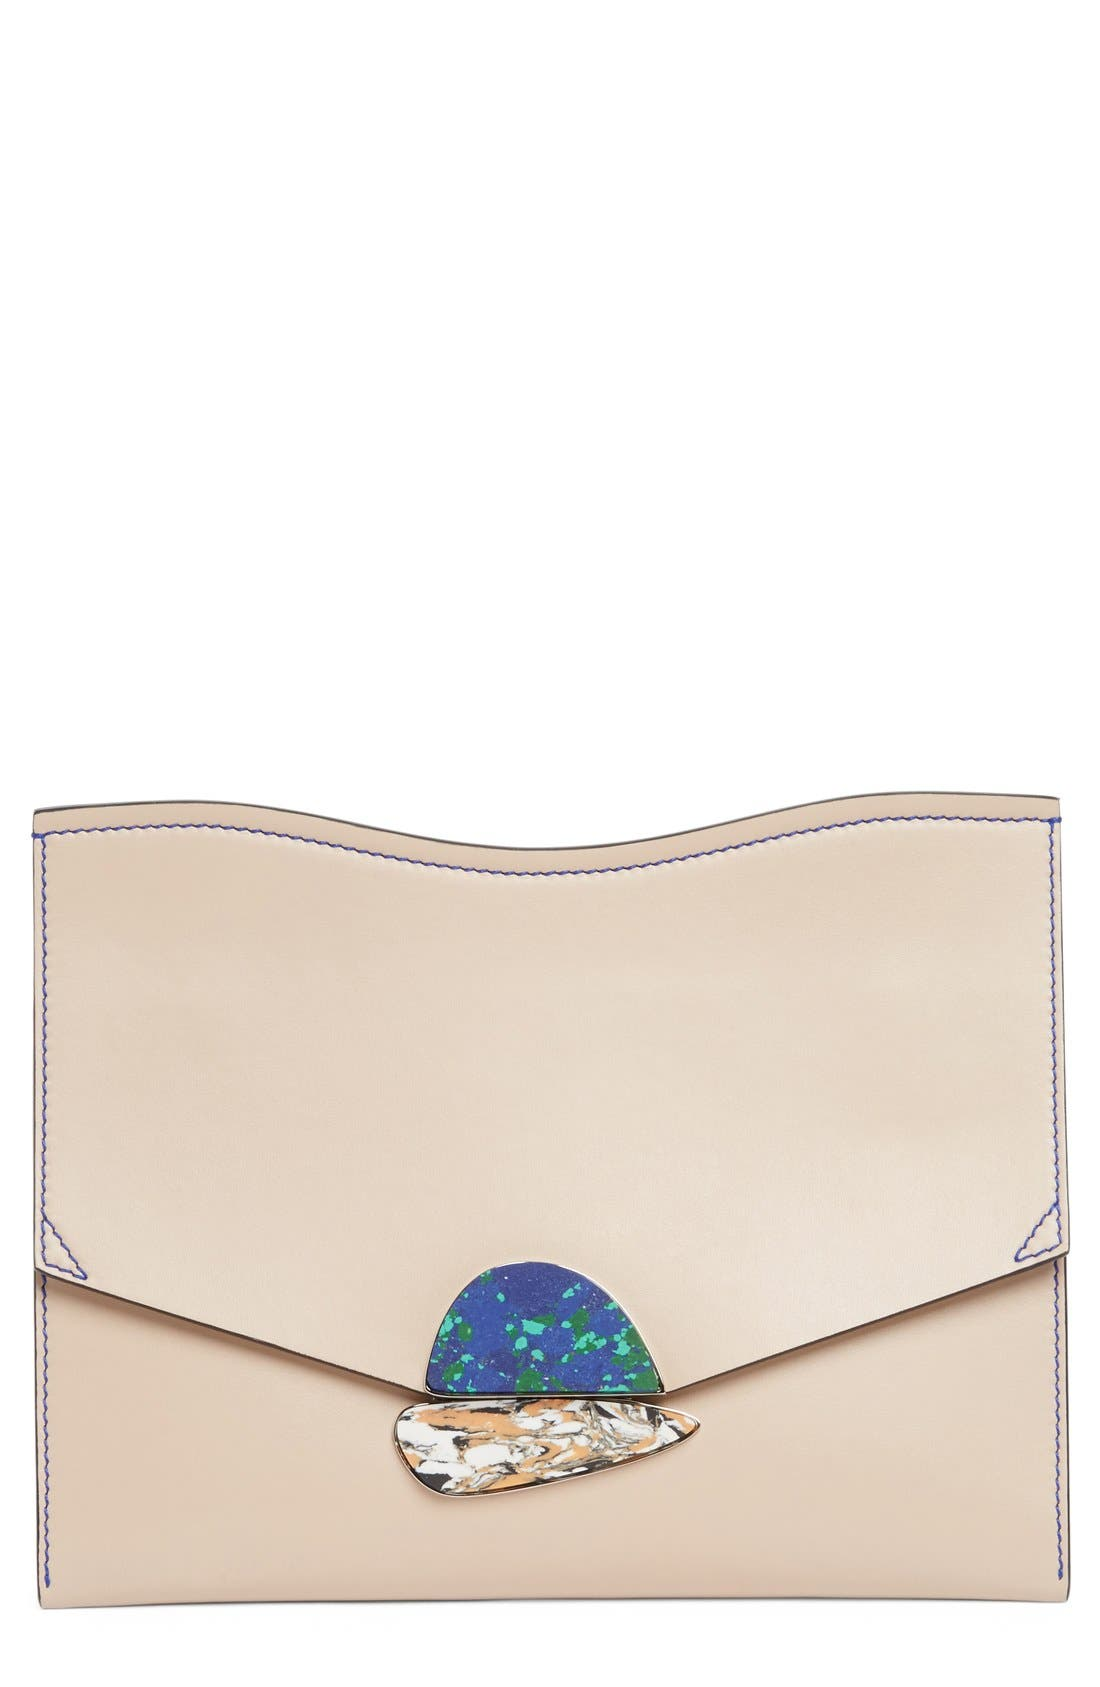 Medium Calfskin Leather Clutch,                         Main,                         color, 250